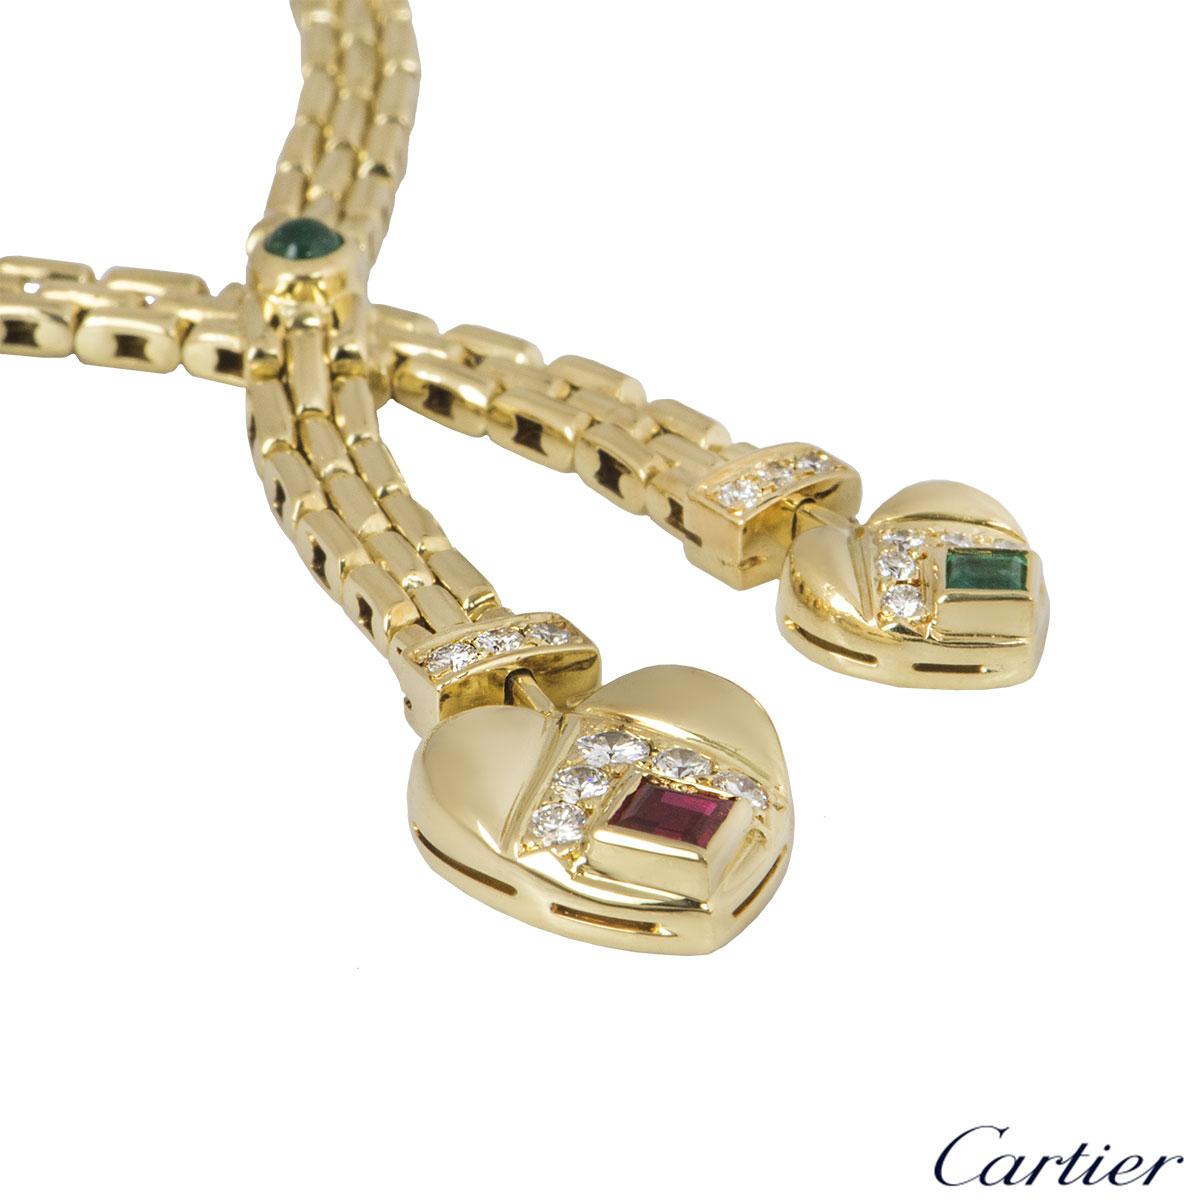 Cartier Yellow Gold Diamond & Multi-Gem 2 Heart Necklace